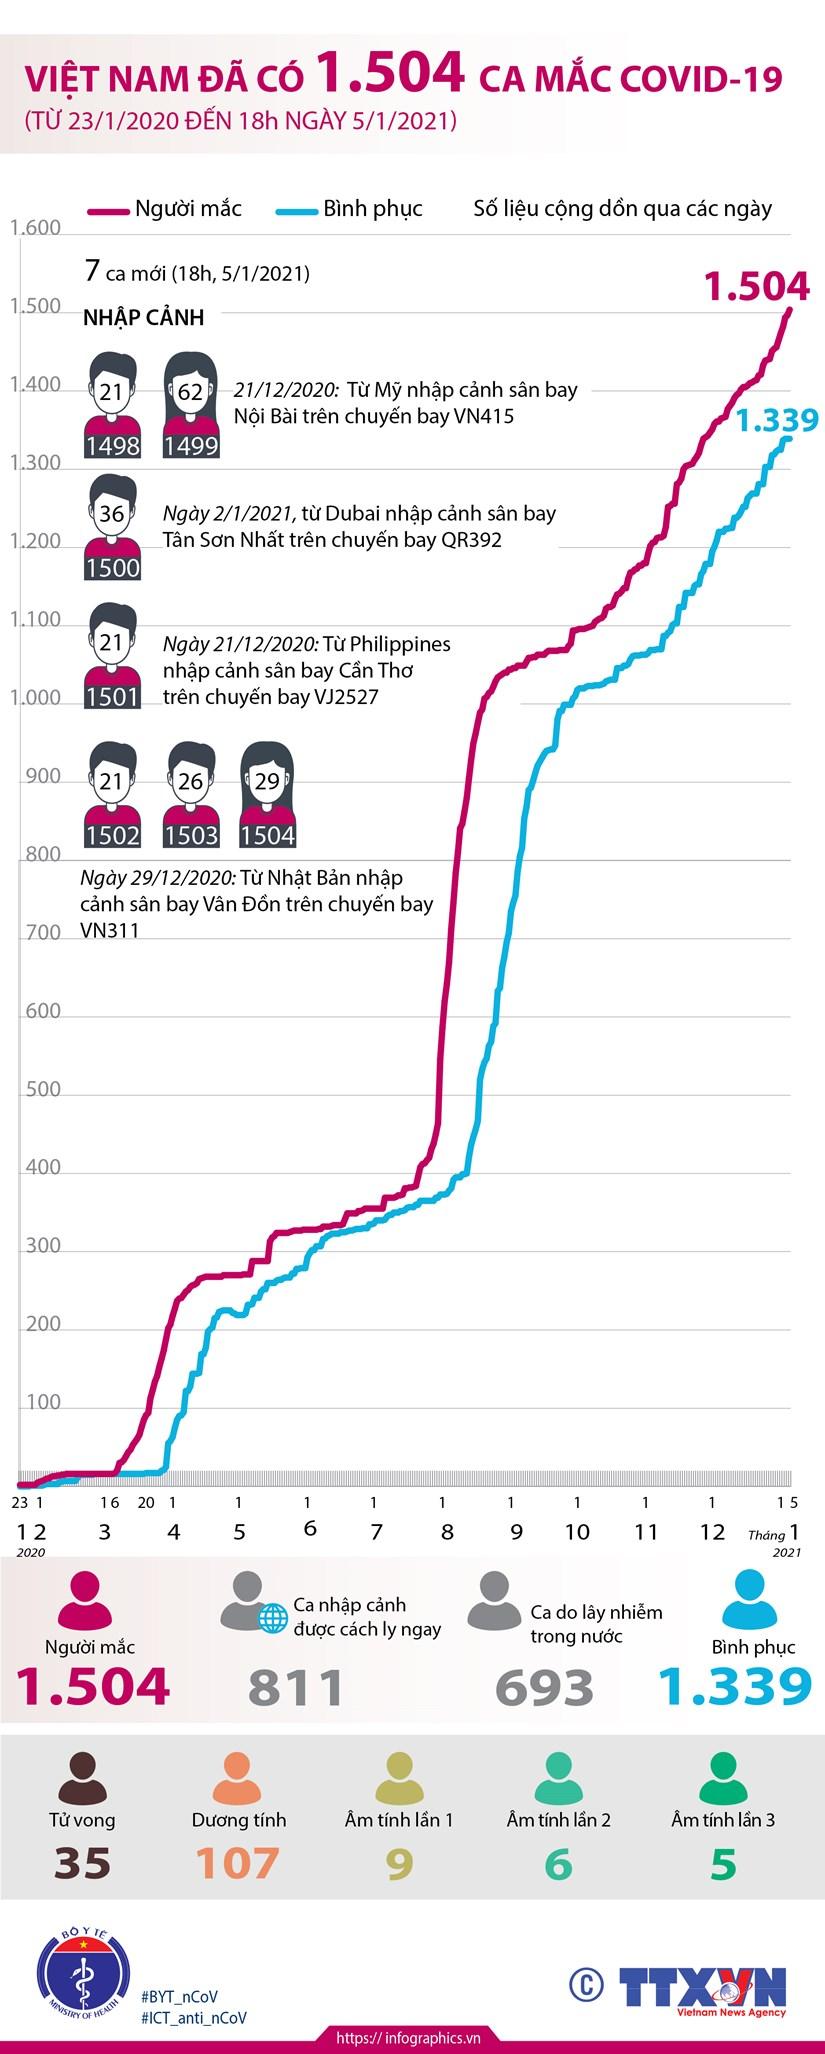 [Infographics] Viet Nam da ghi nhan co 1.504 ca mac COVID-19 hinh anh 1